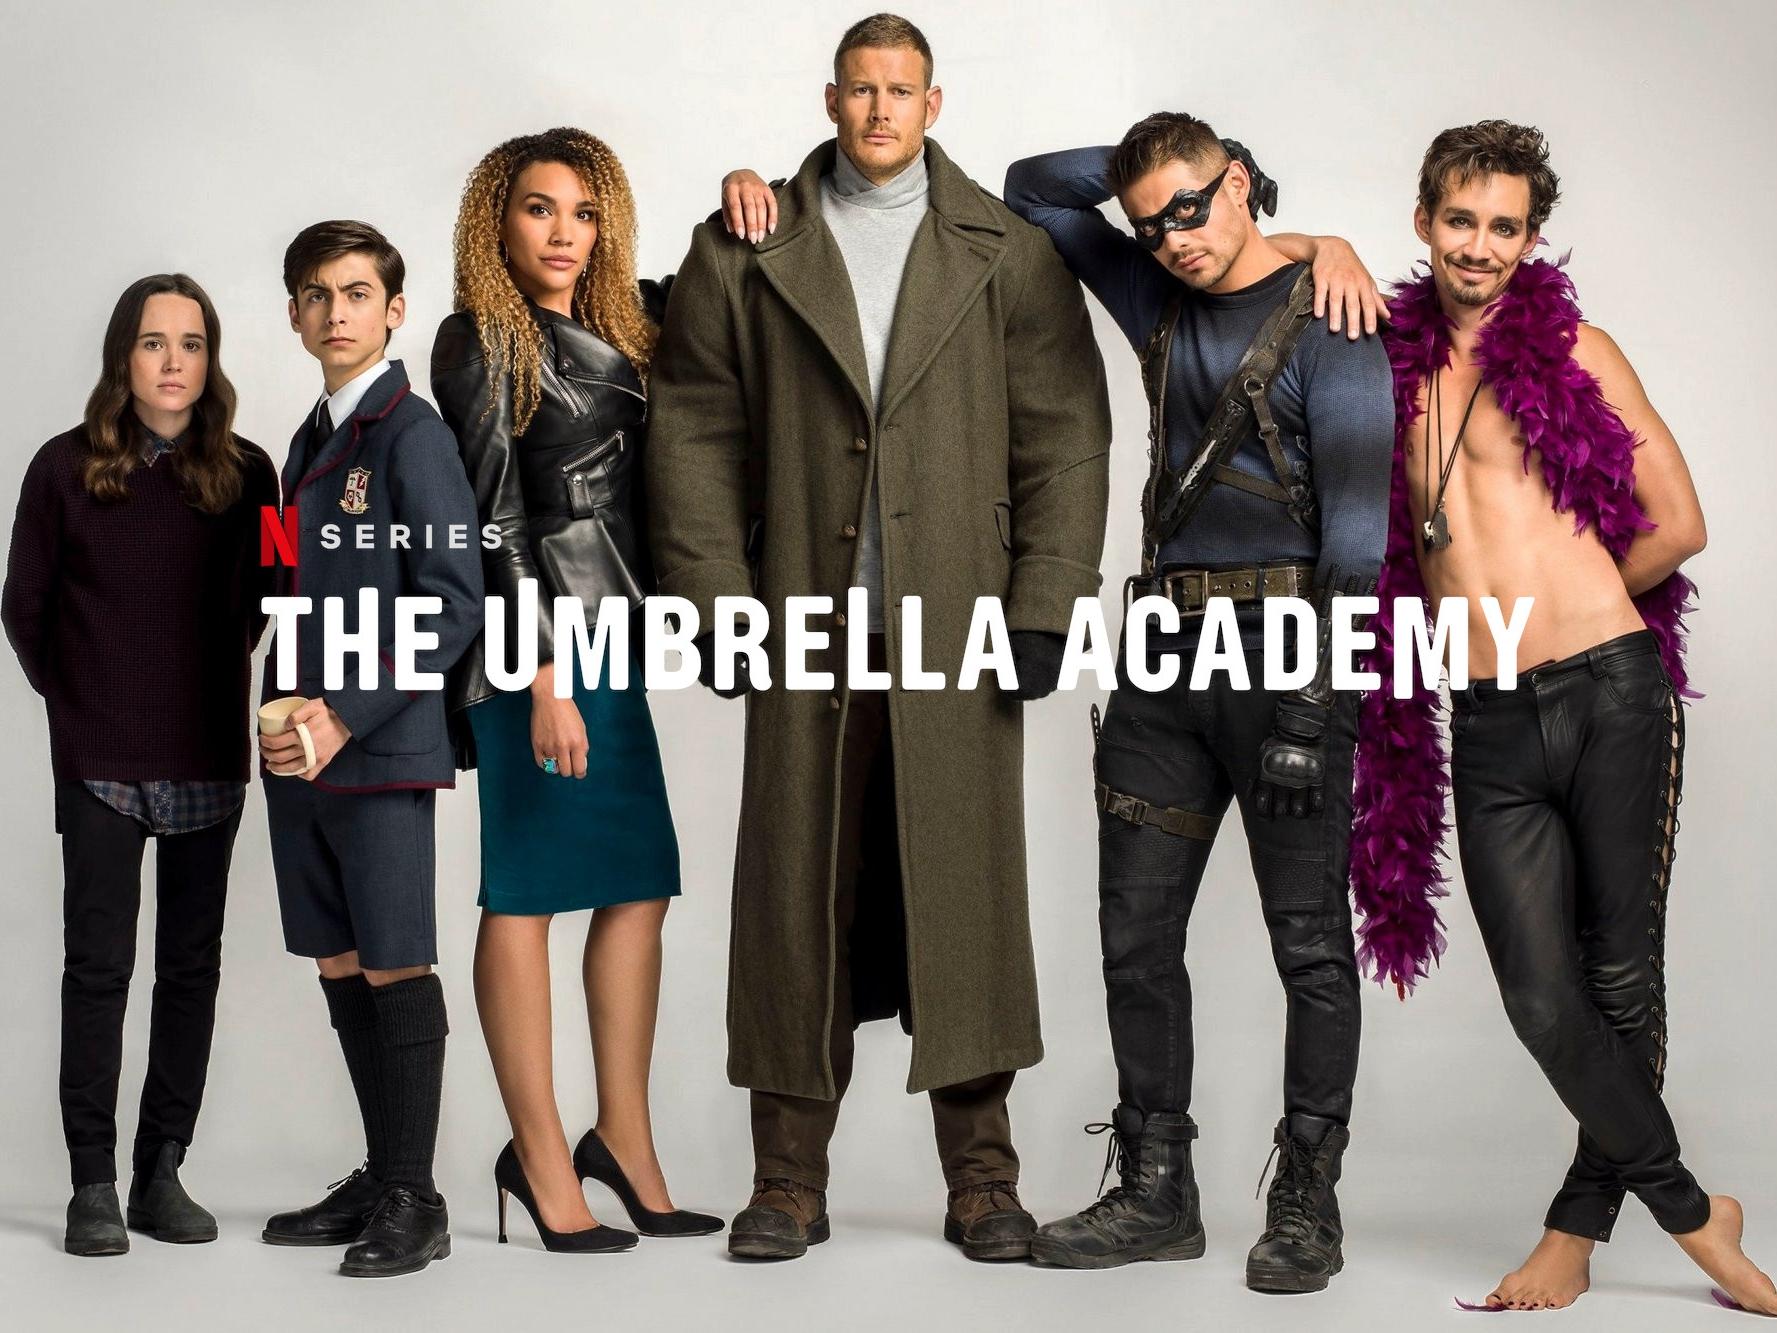 Съёмки сериала «Академия Амбрелла» начнутся в начале 2021 года